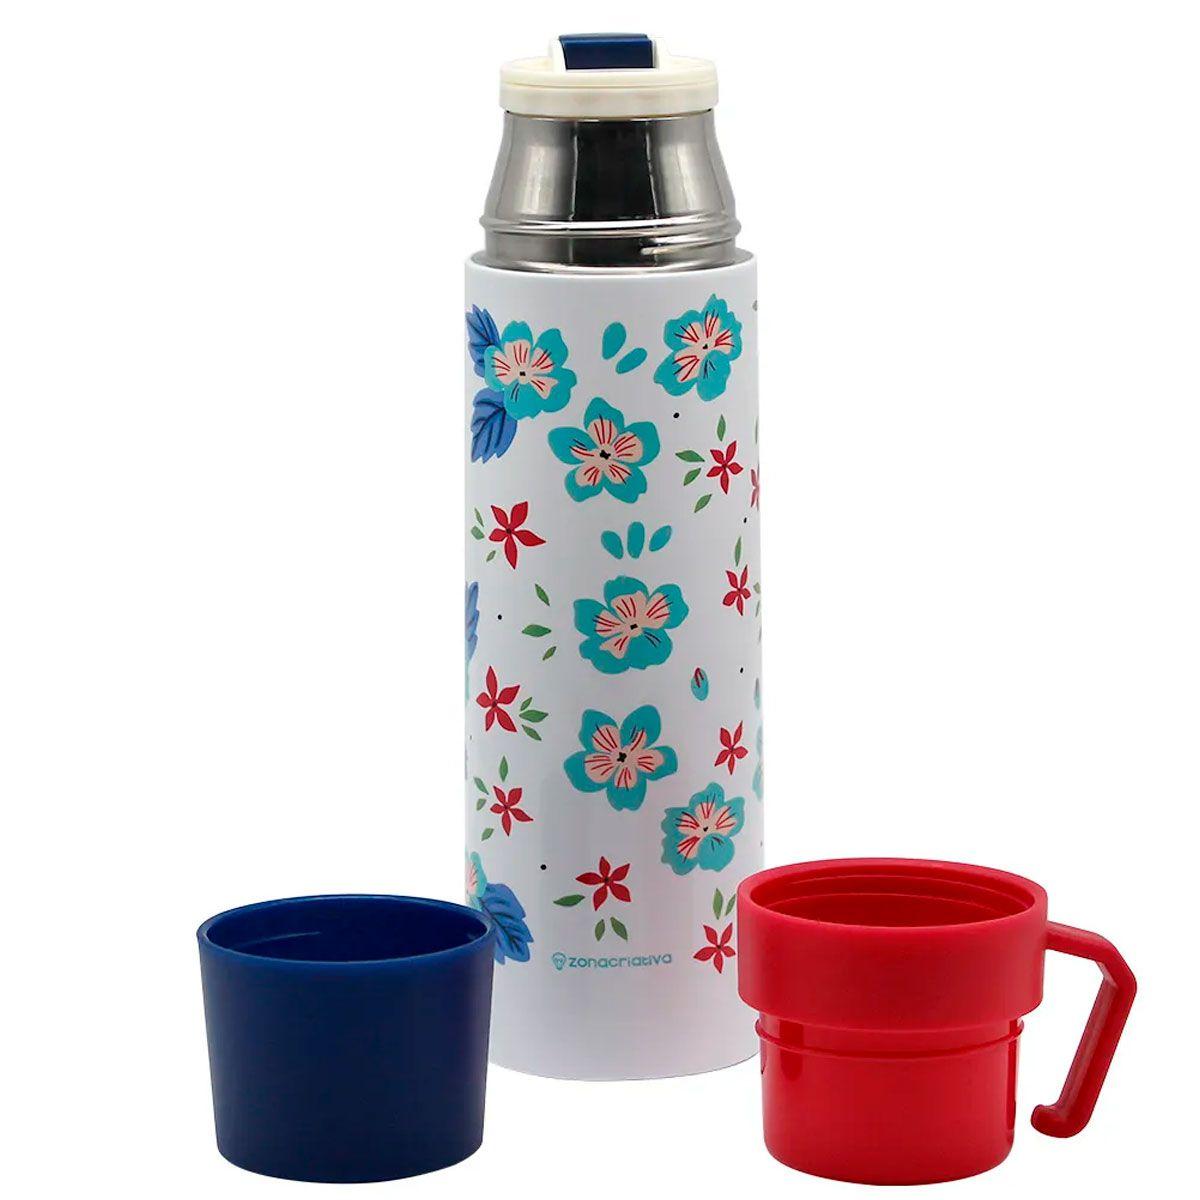 Garrafa Térmica 500 ml com Caneca Floral